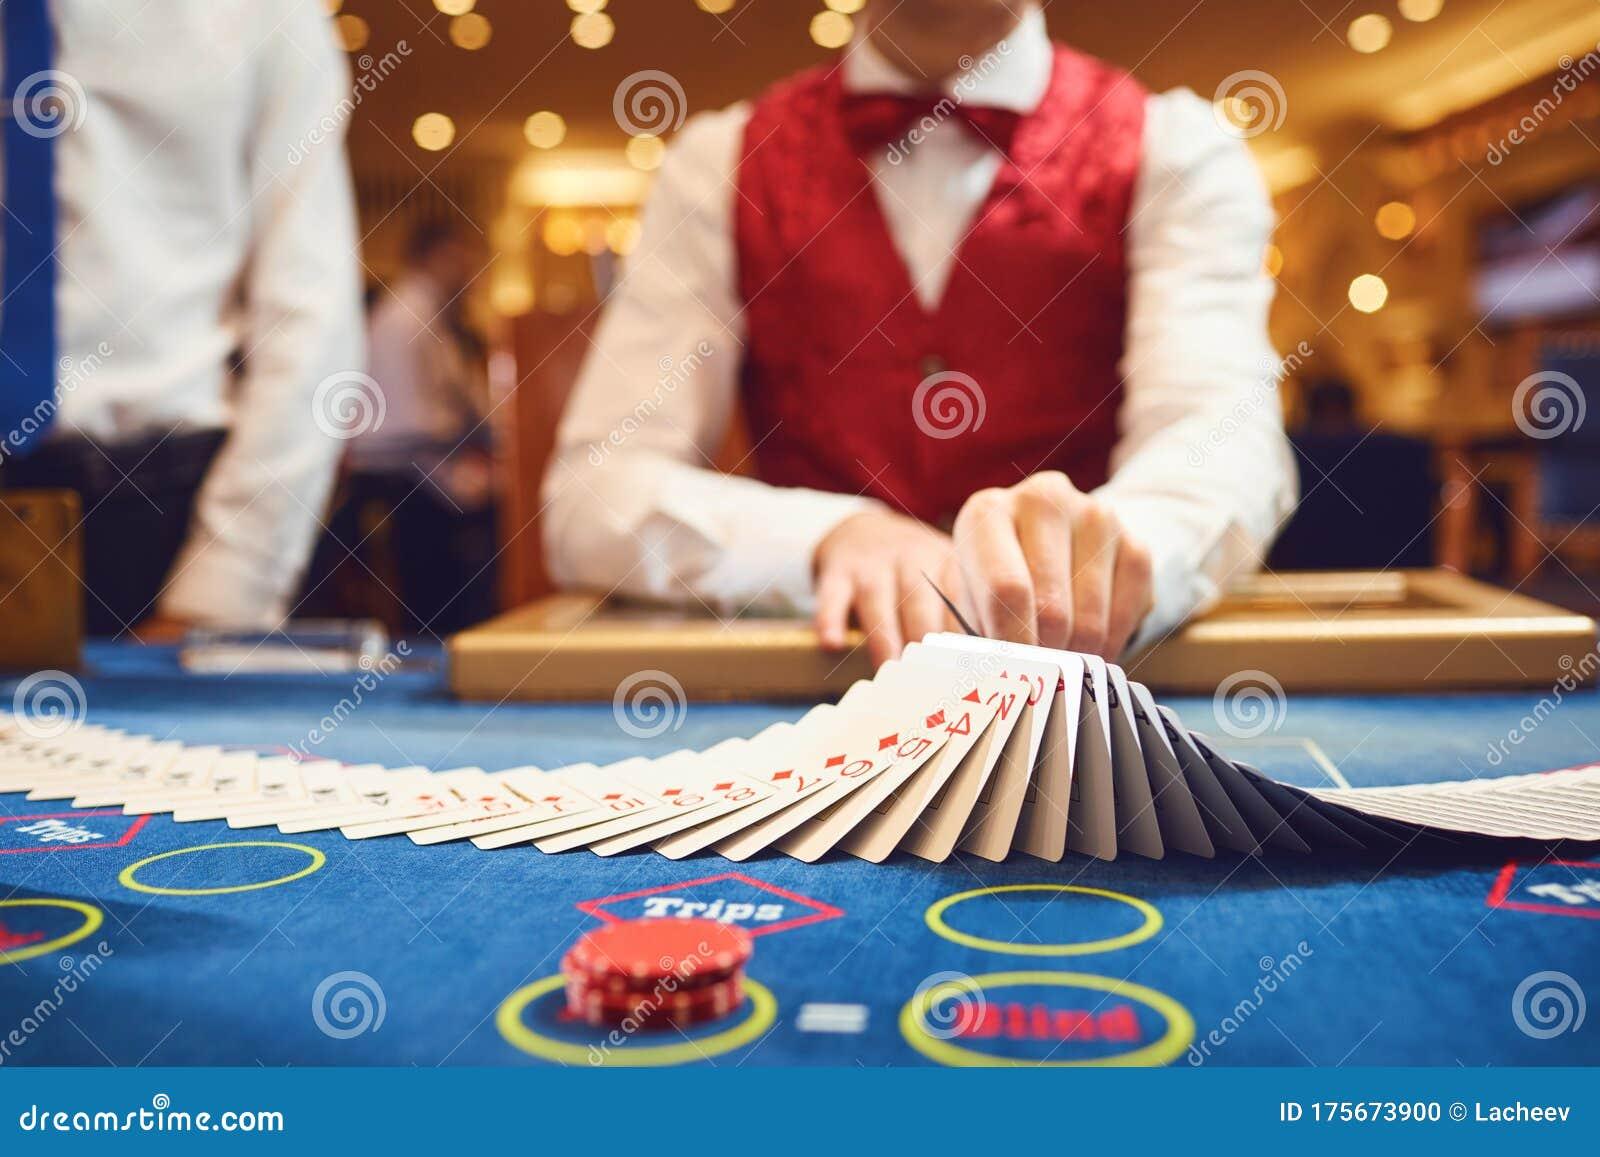 Casino casino gambling poker roulette wind creek casino entertainment